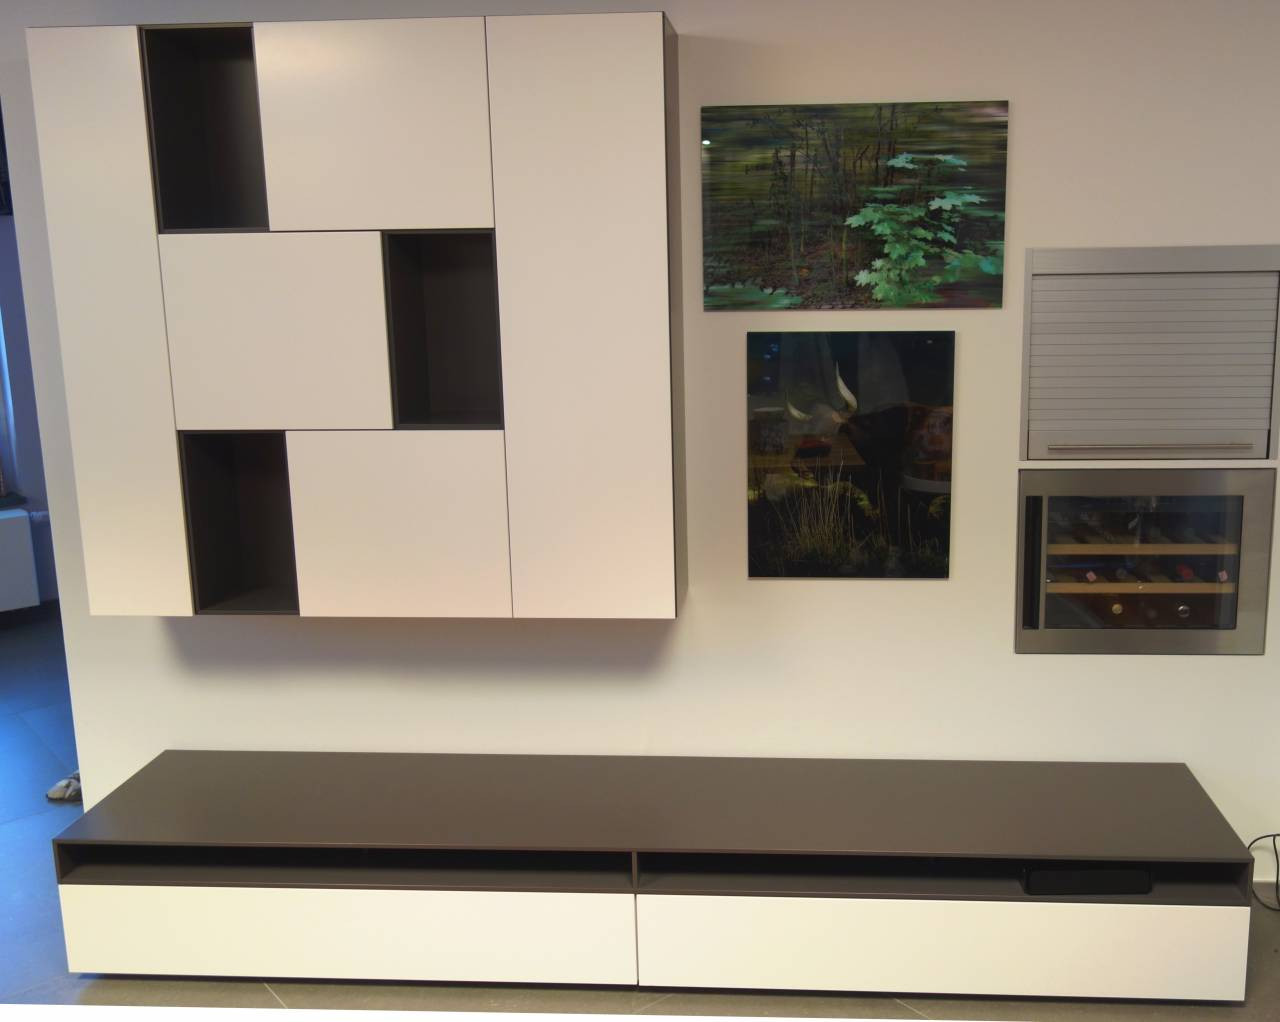 Wohnwand Interlubke Cube Change Cube Play Designermobel Bestwig